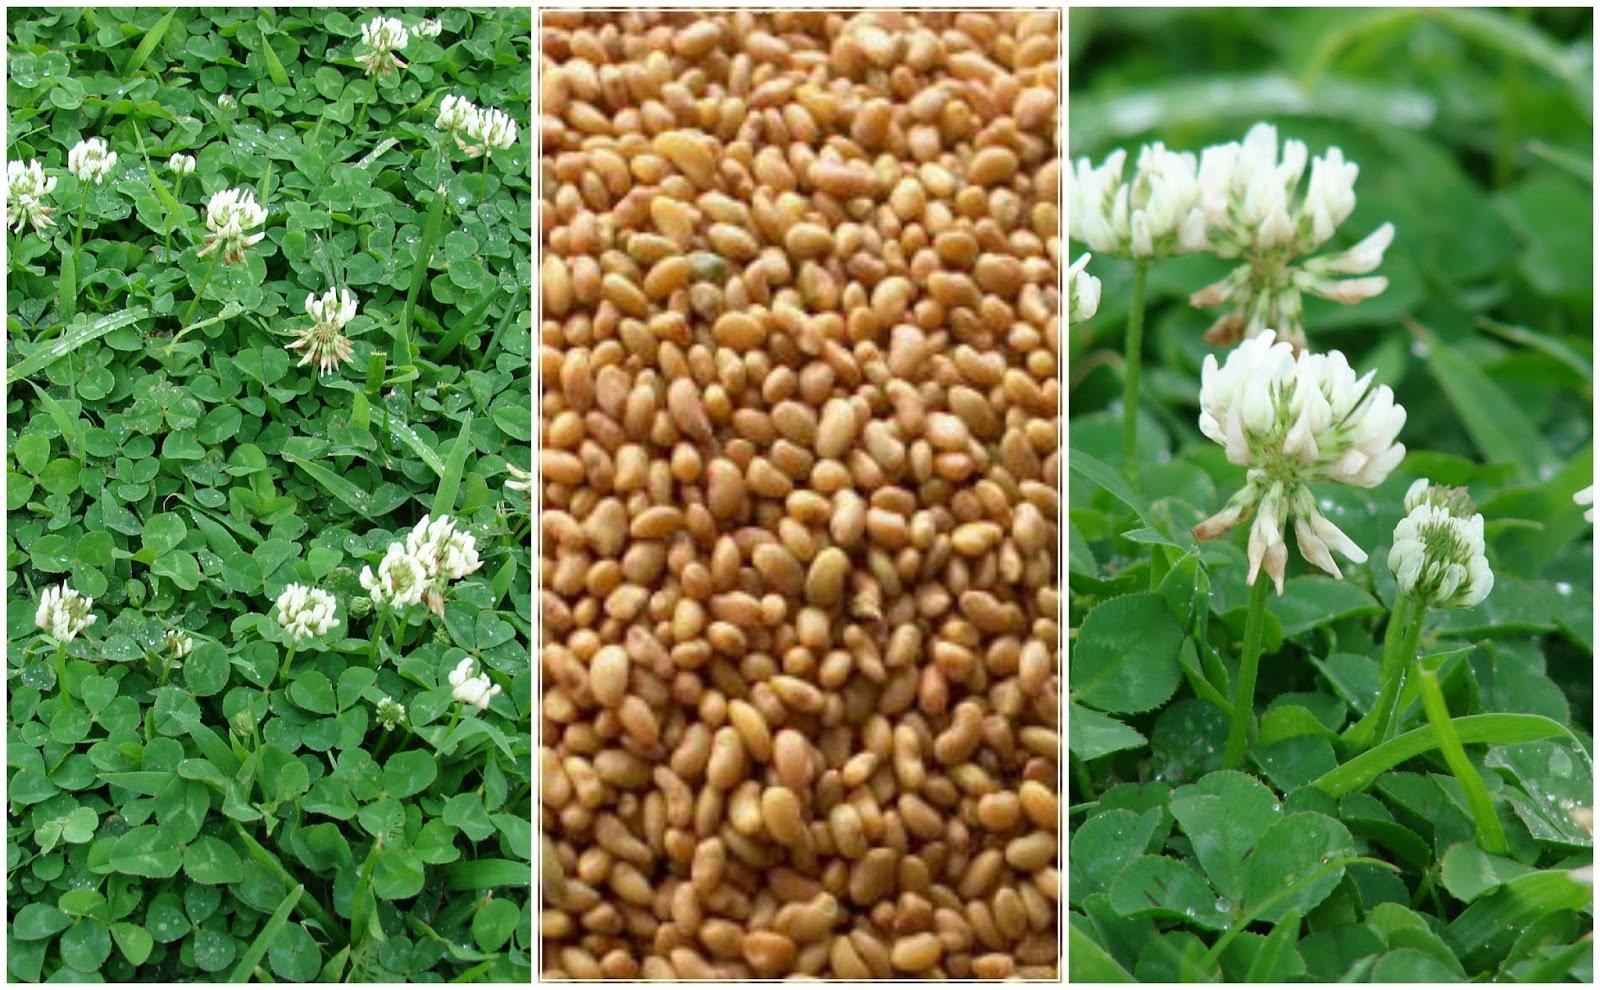 Plants for Pathways - Trifolium repens - White Clover.